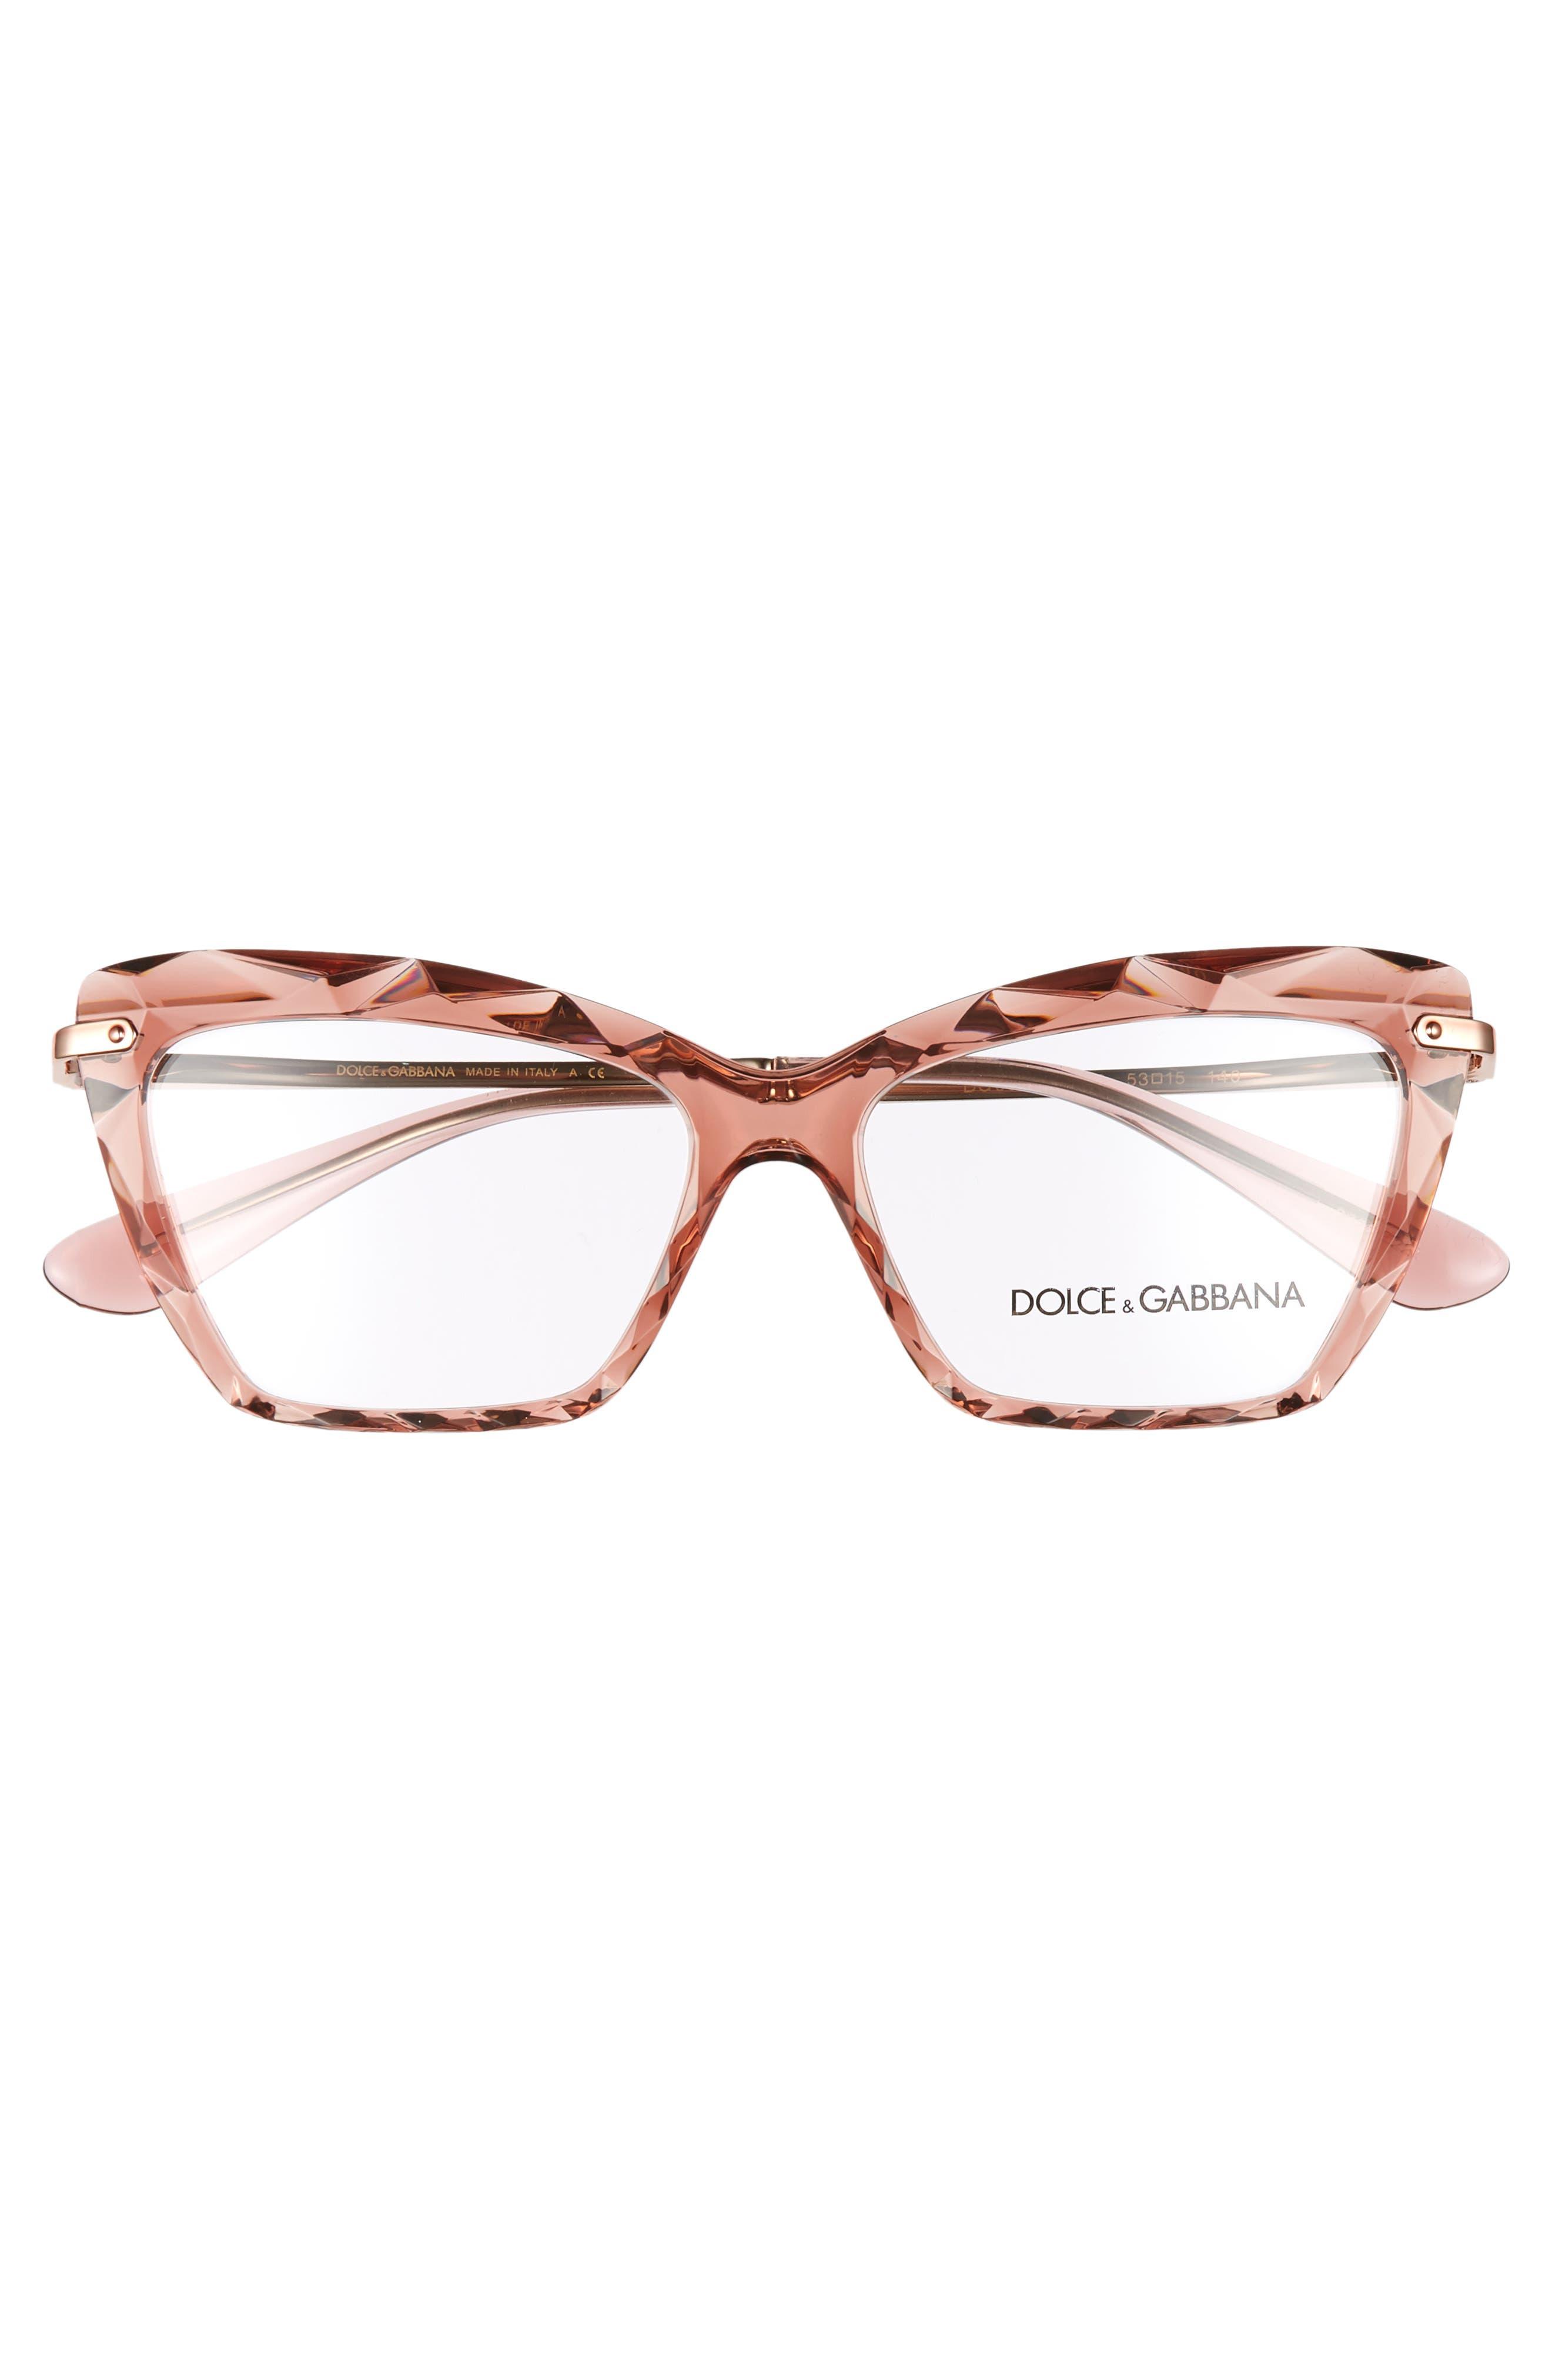 DOLCE&GABBANA, 53mm Cat Eye Optical Glasses, Alternate thumbnail 3, color, TRANSPARENT PINK